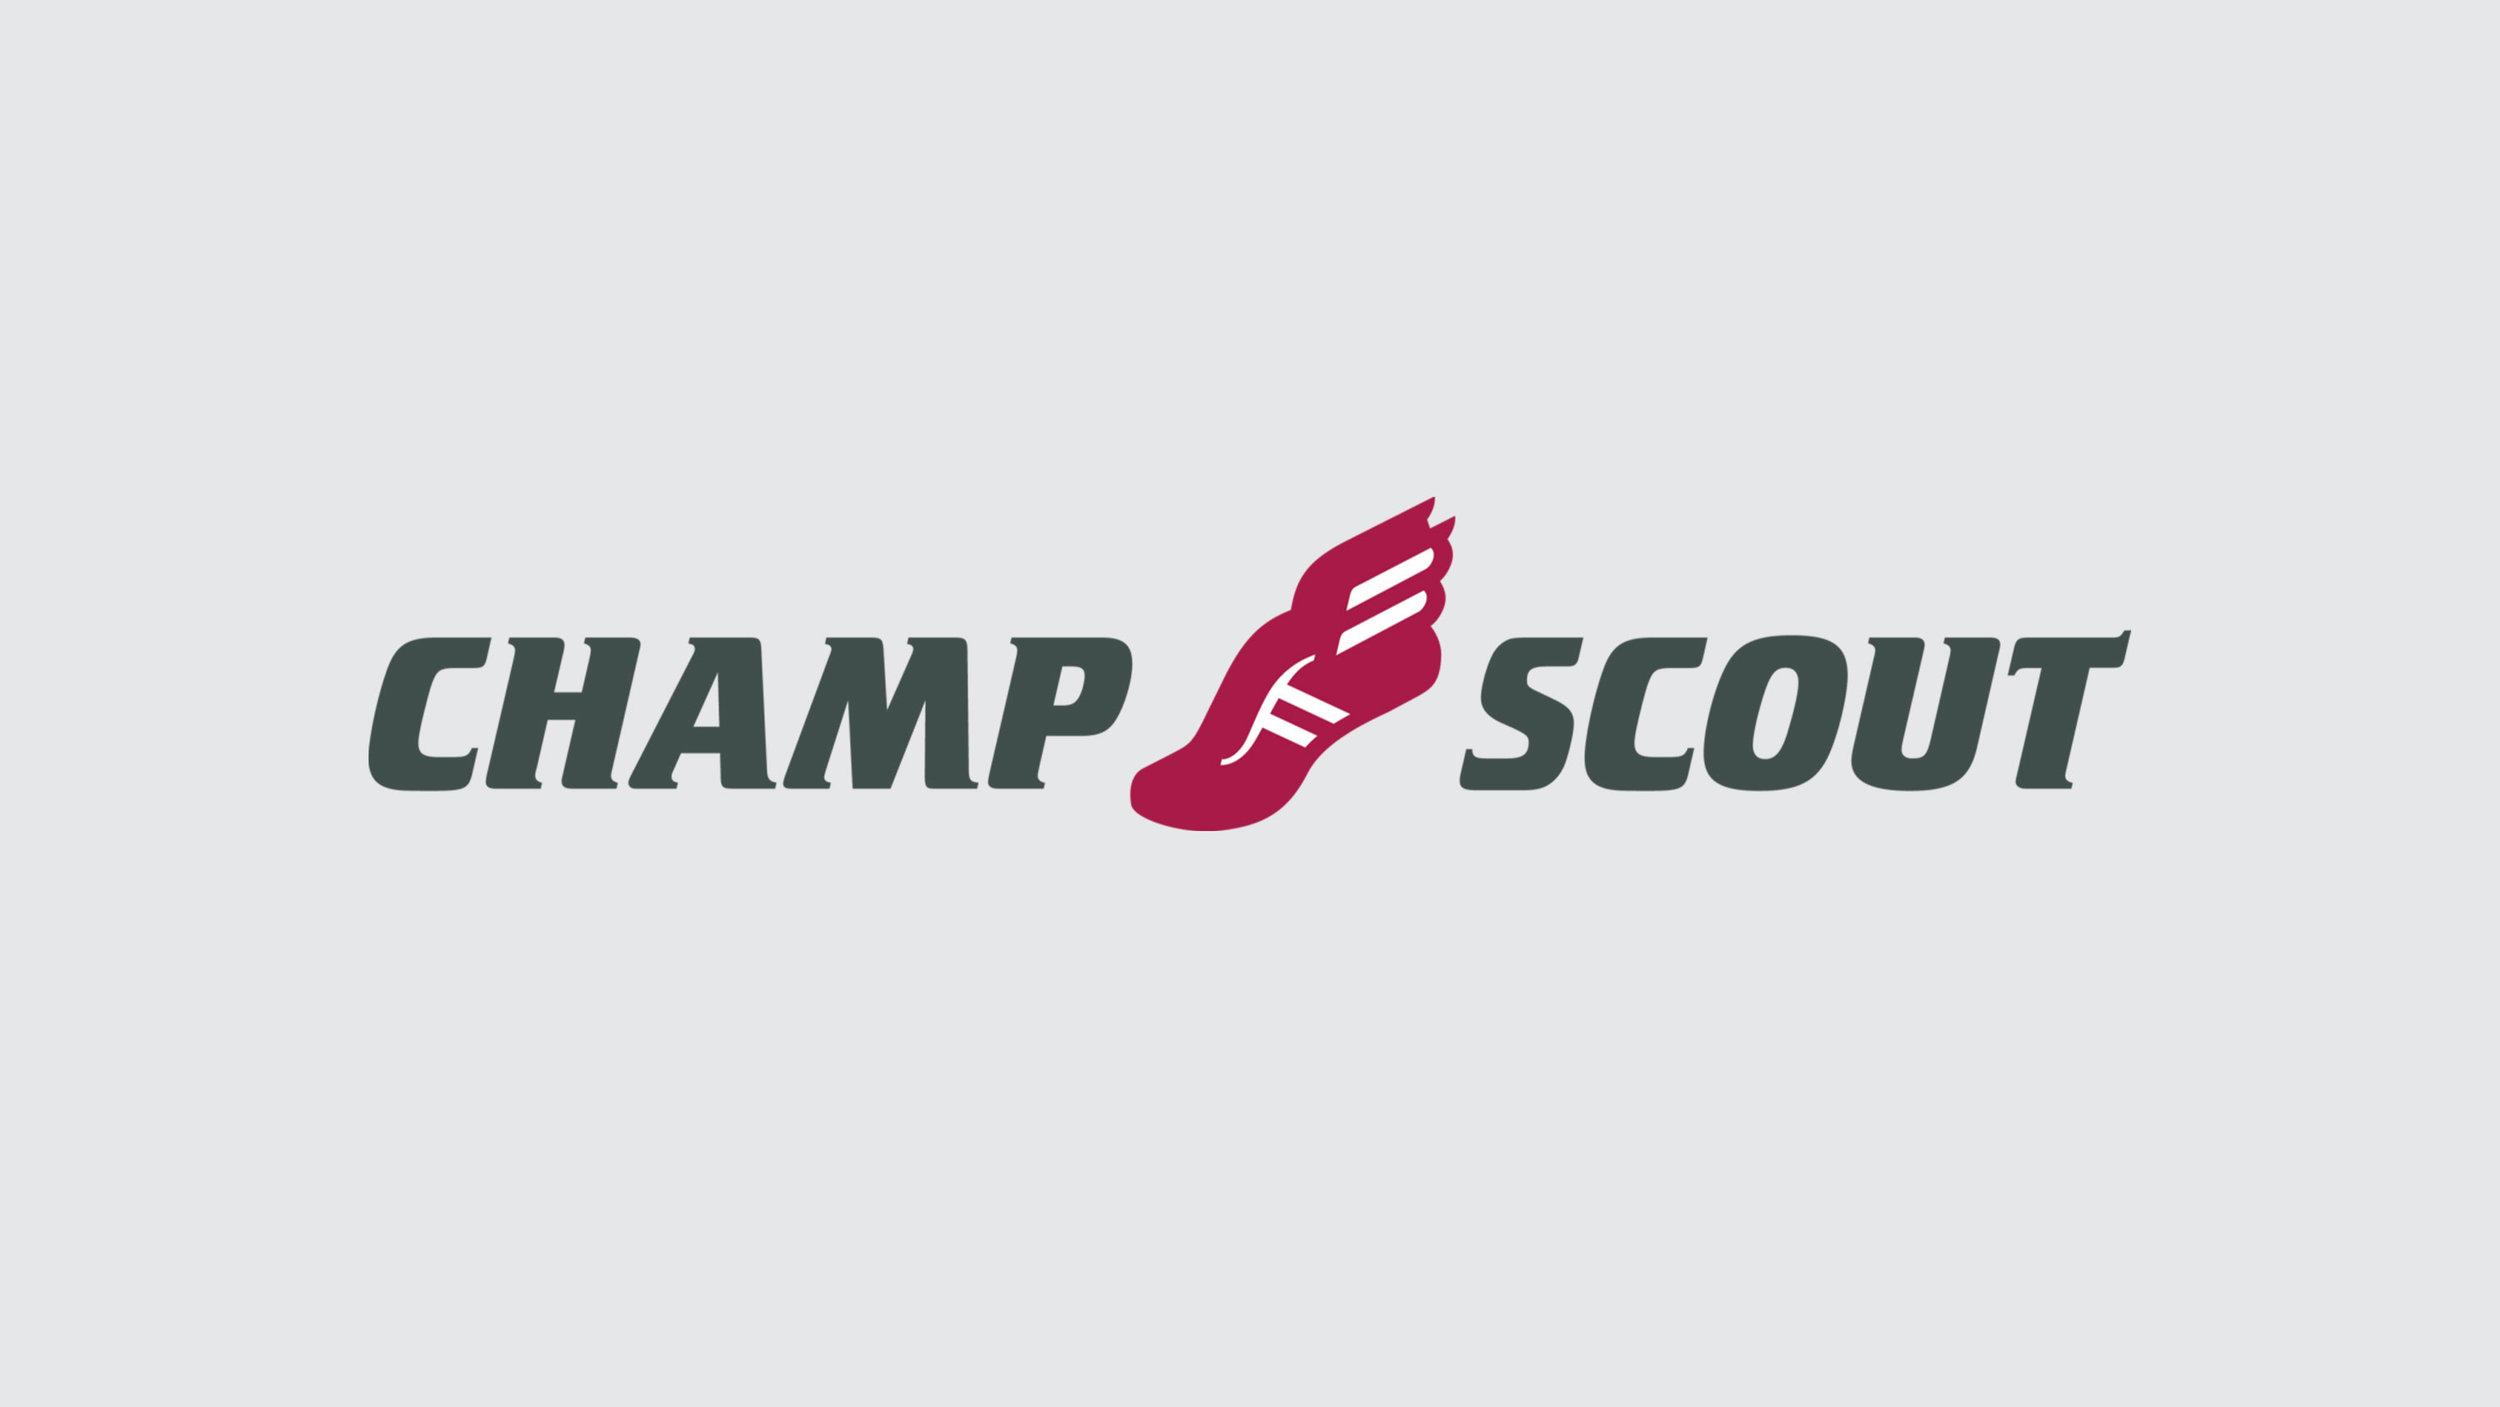 Champ-Scout.jpg